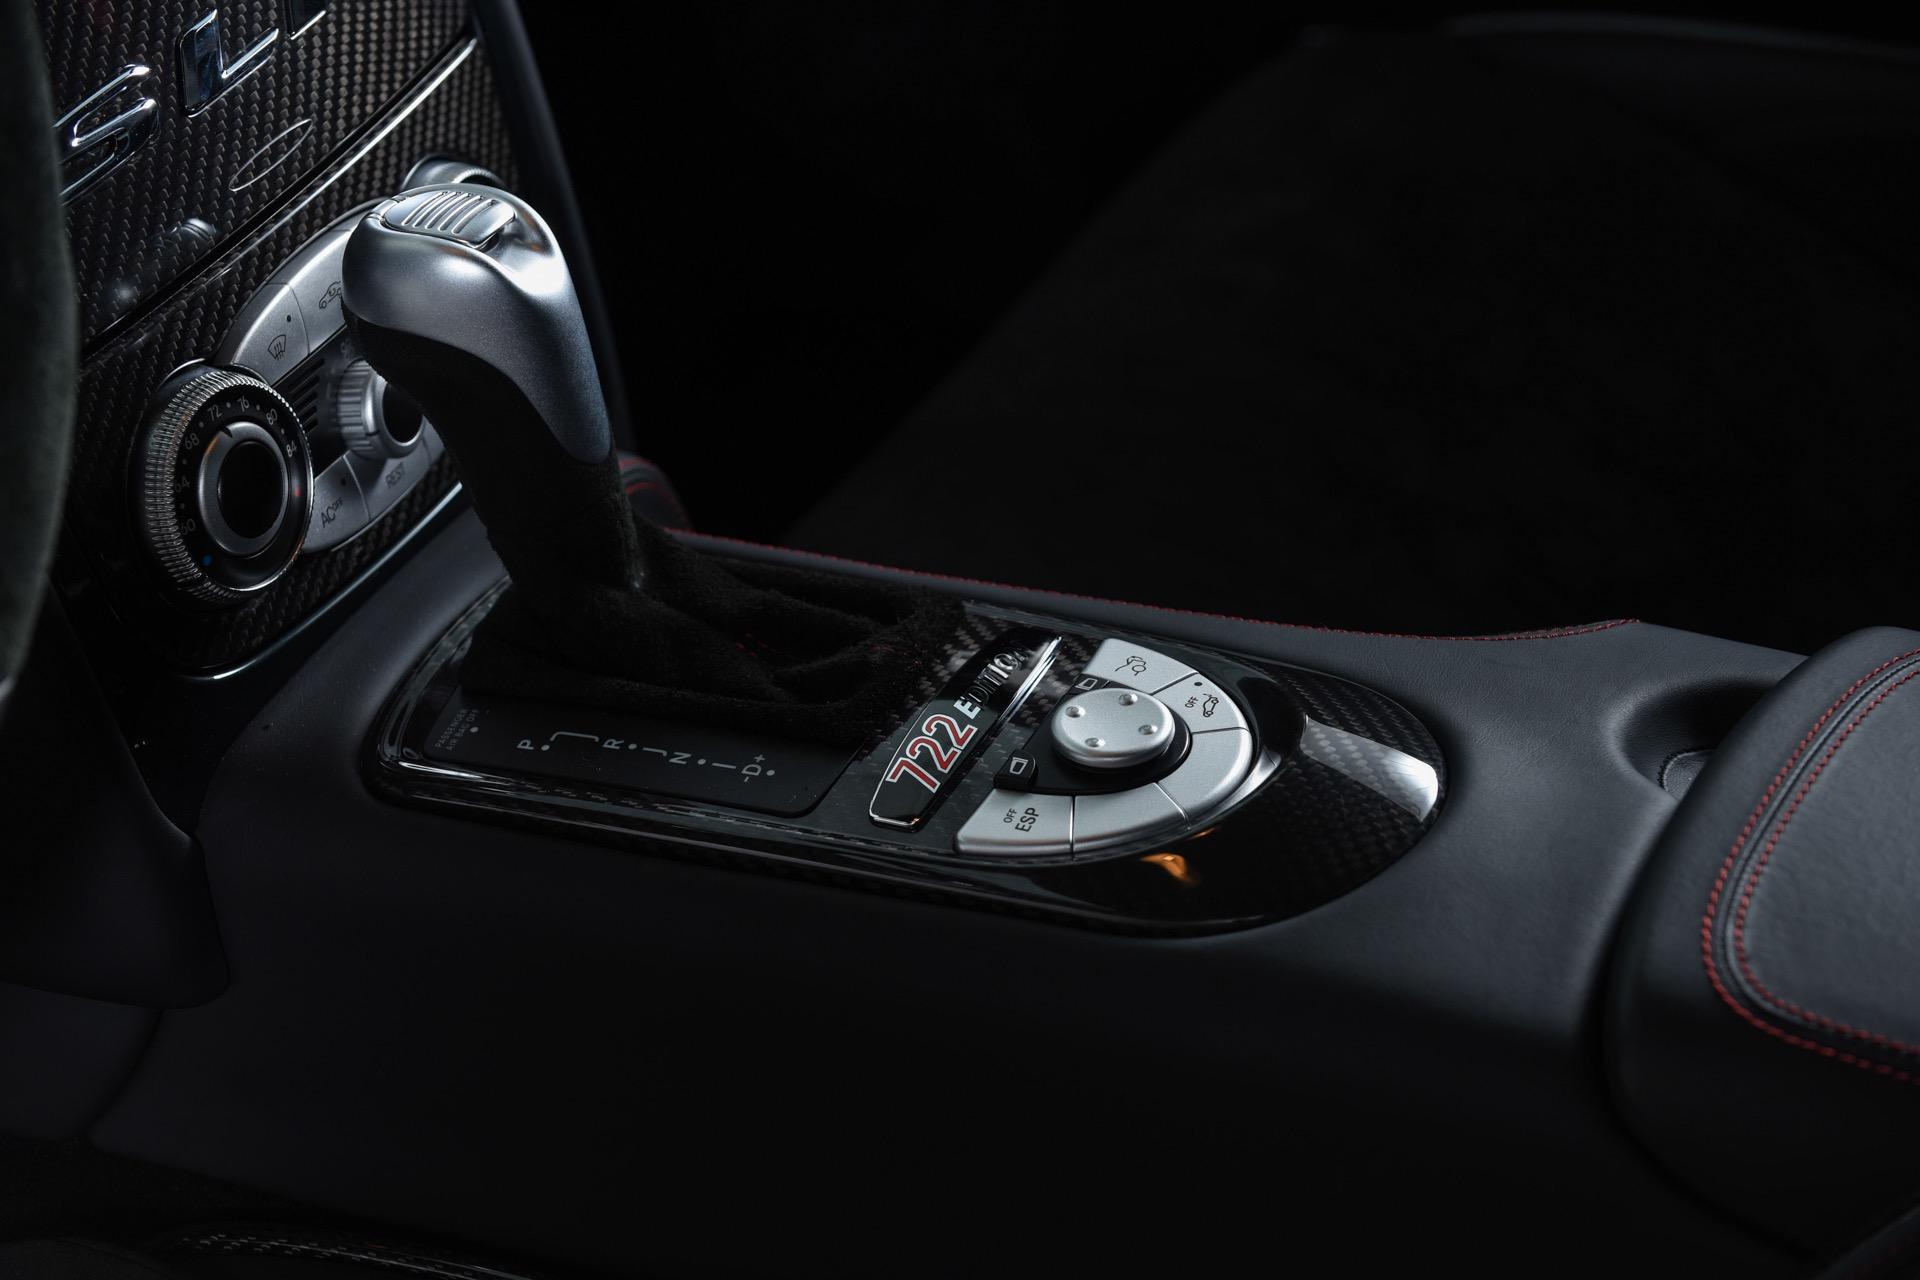 2007 Mercedes-Benz SLR McLaren 722